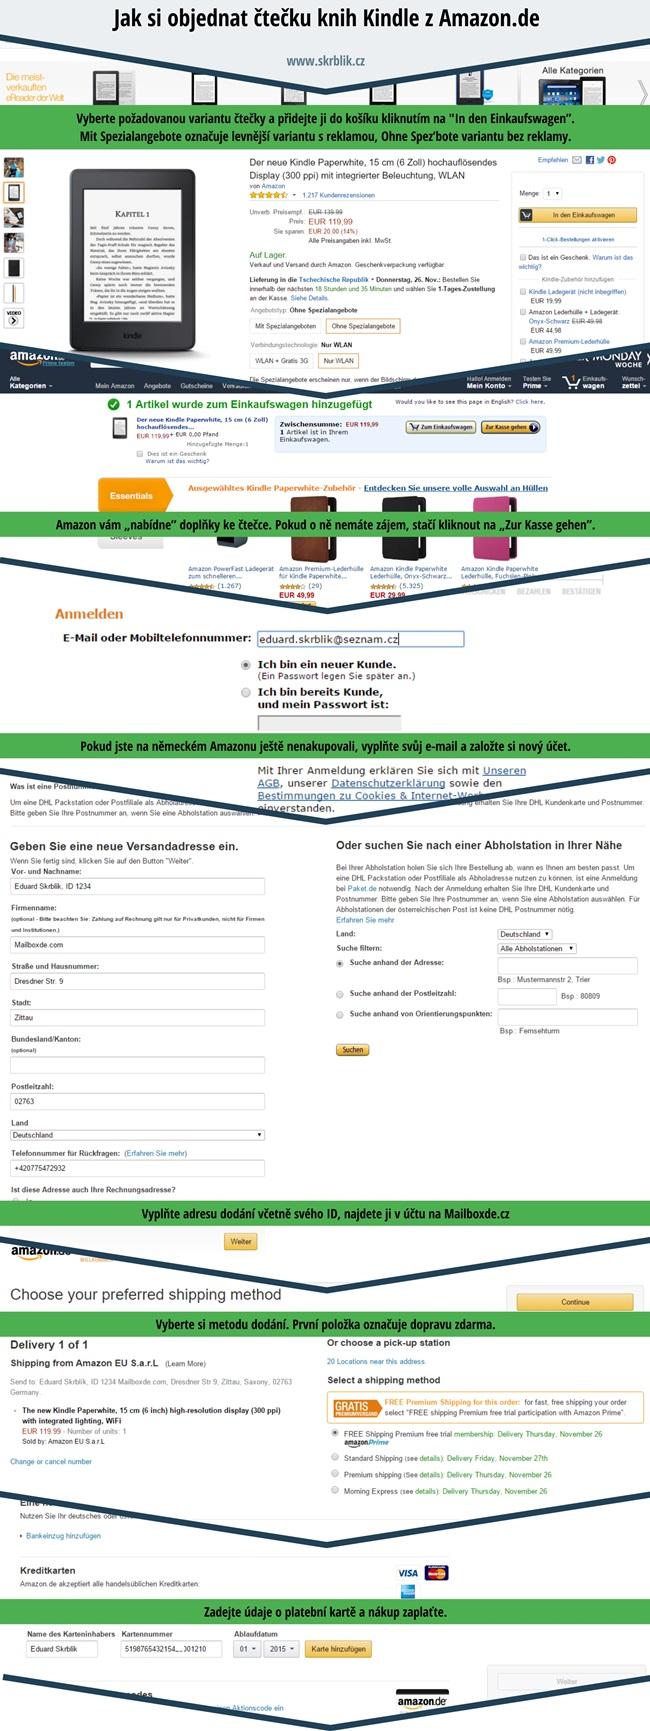 Jak si objednat Amazon Kindle